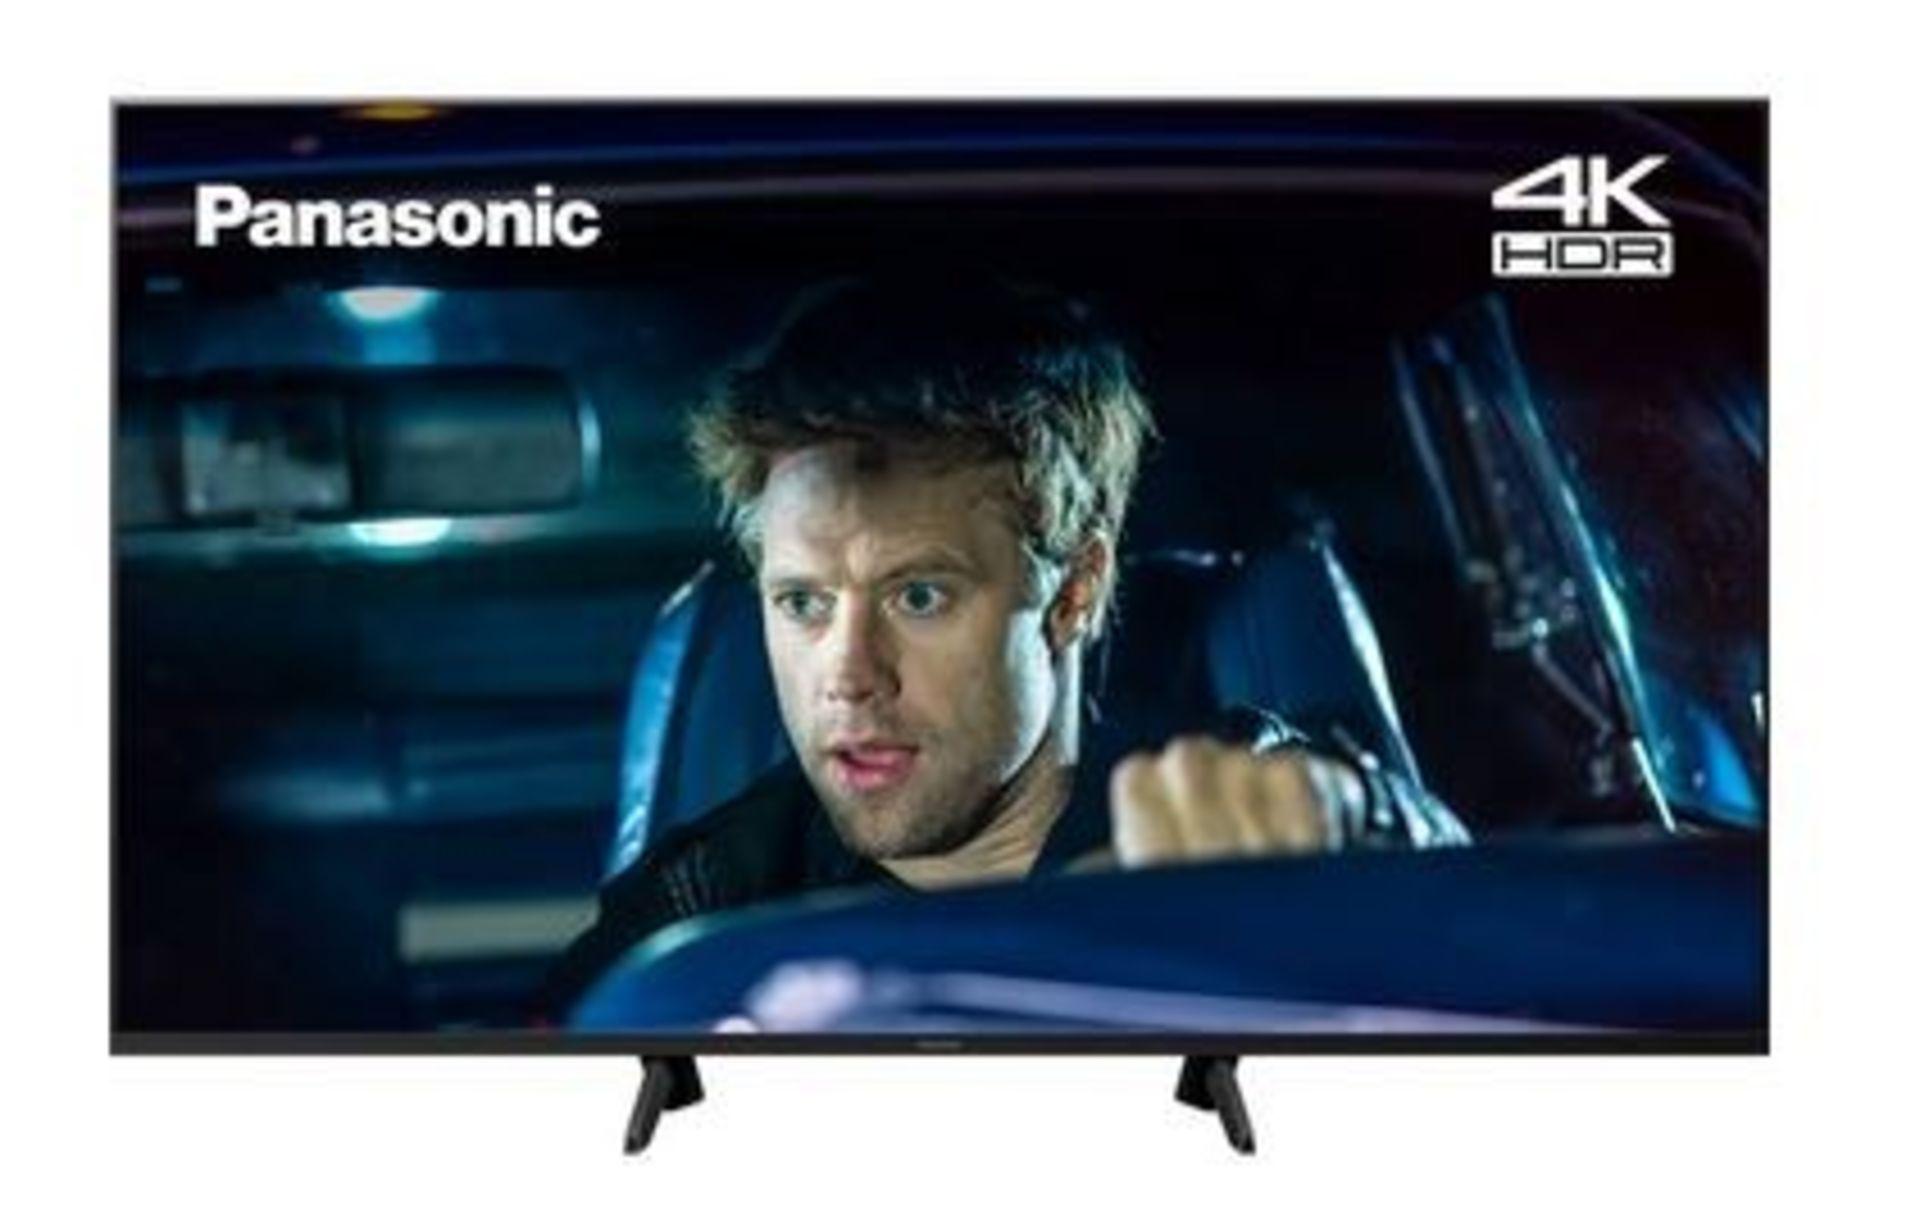 "Lot 1Q - 1 UNTESTED PANASONIC 65"" SMART 4K ULTRA HD LED TV - TX-65FX560B / SCREEN DAMAGED, SPARES AND REPAIRS"